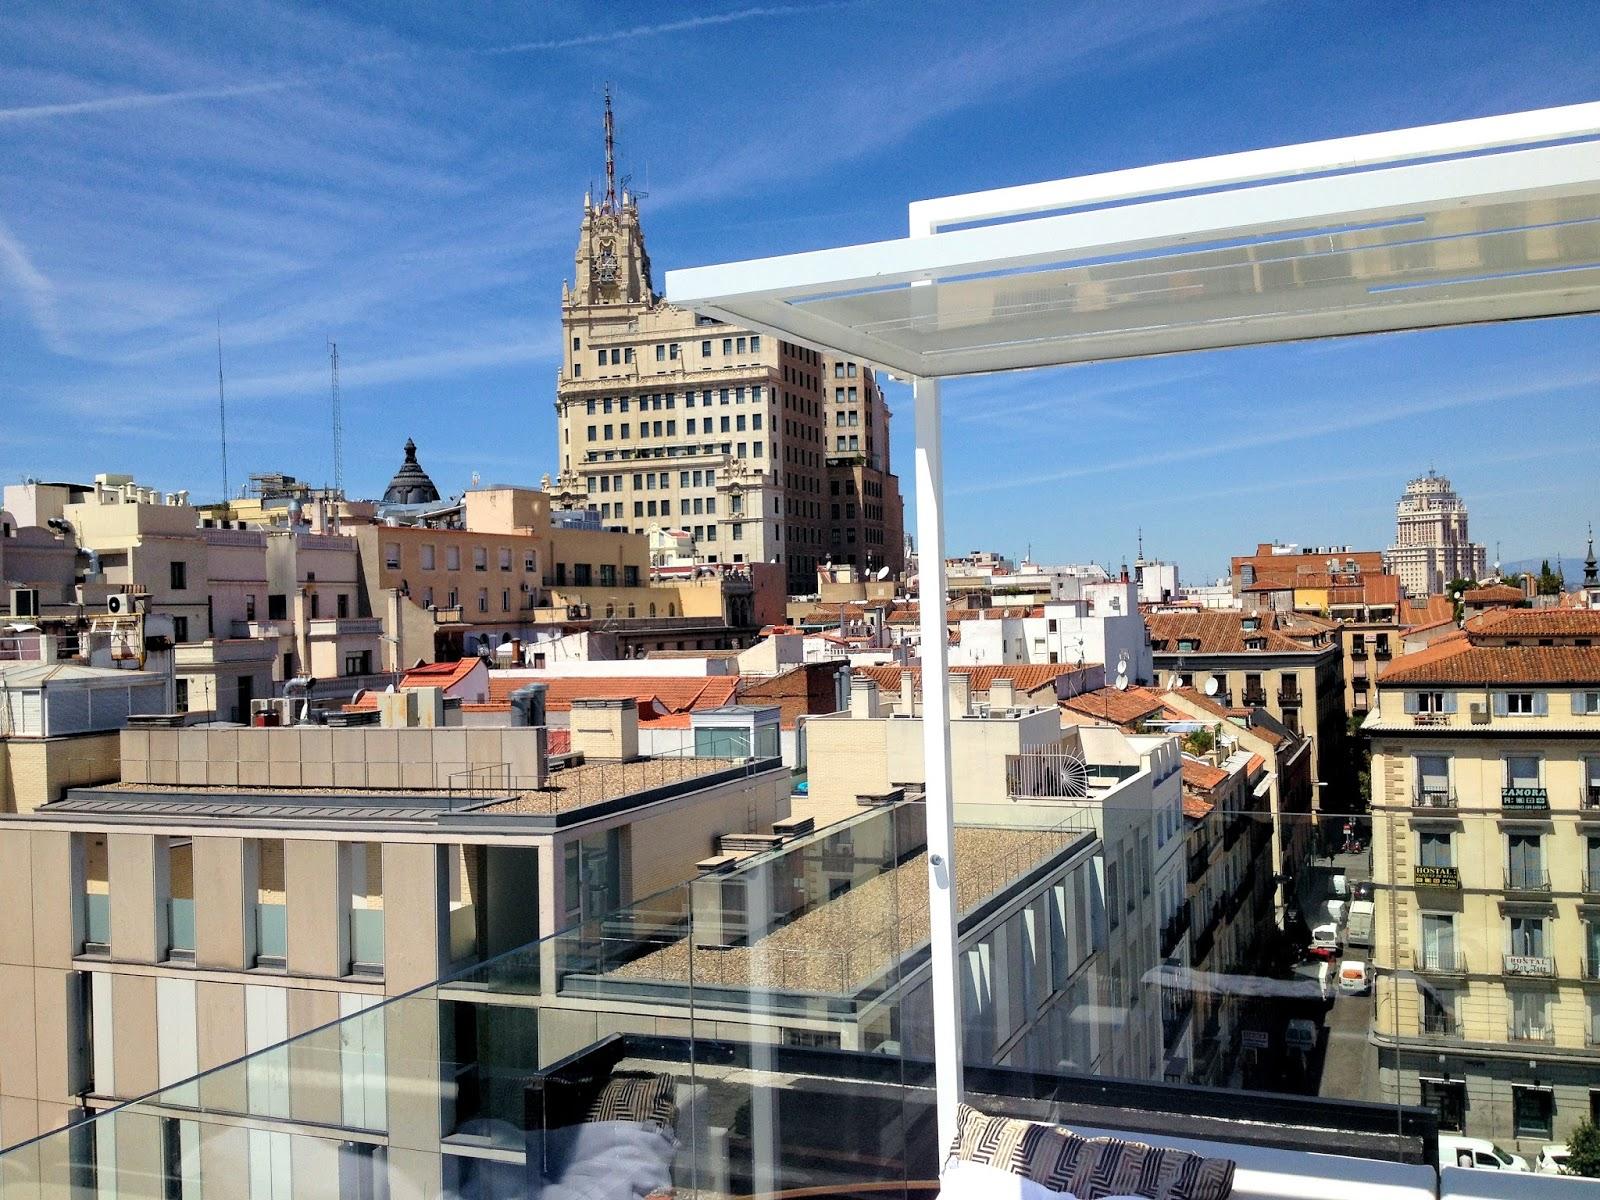 Otium terrazas madrid 2014 iii silencio y glamour en la for Azoteas madrid